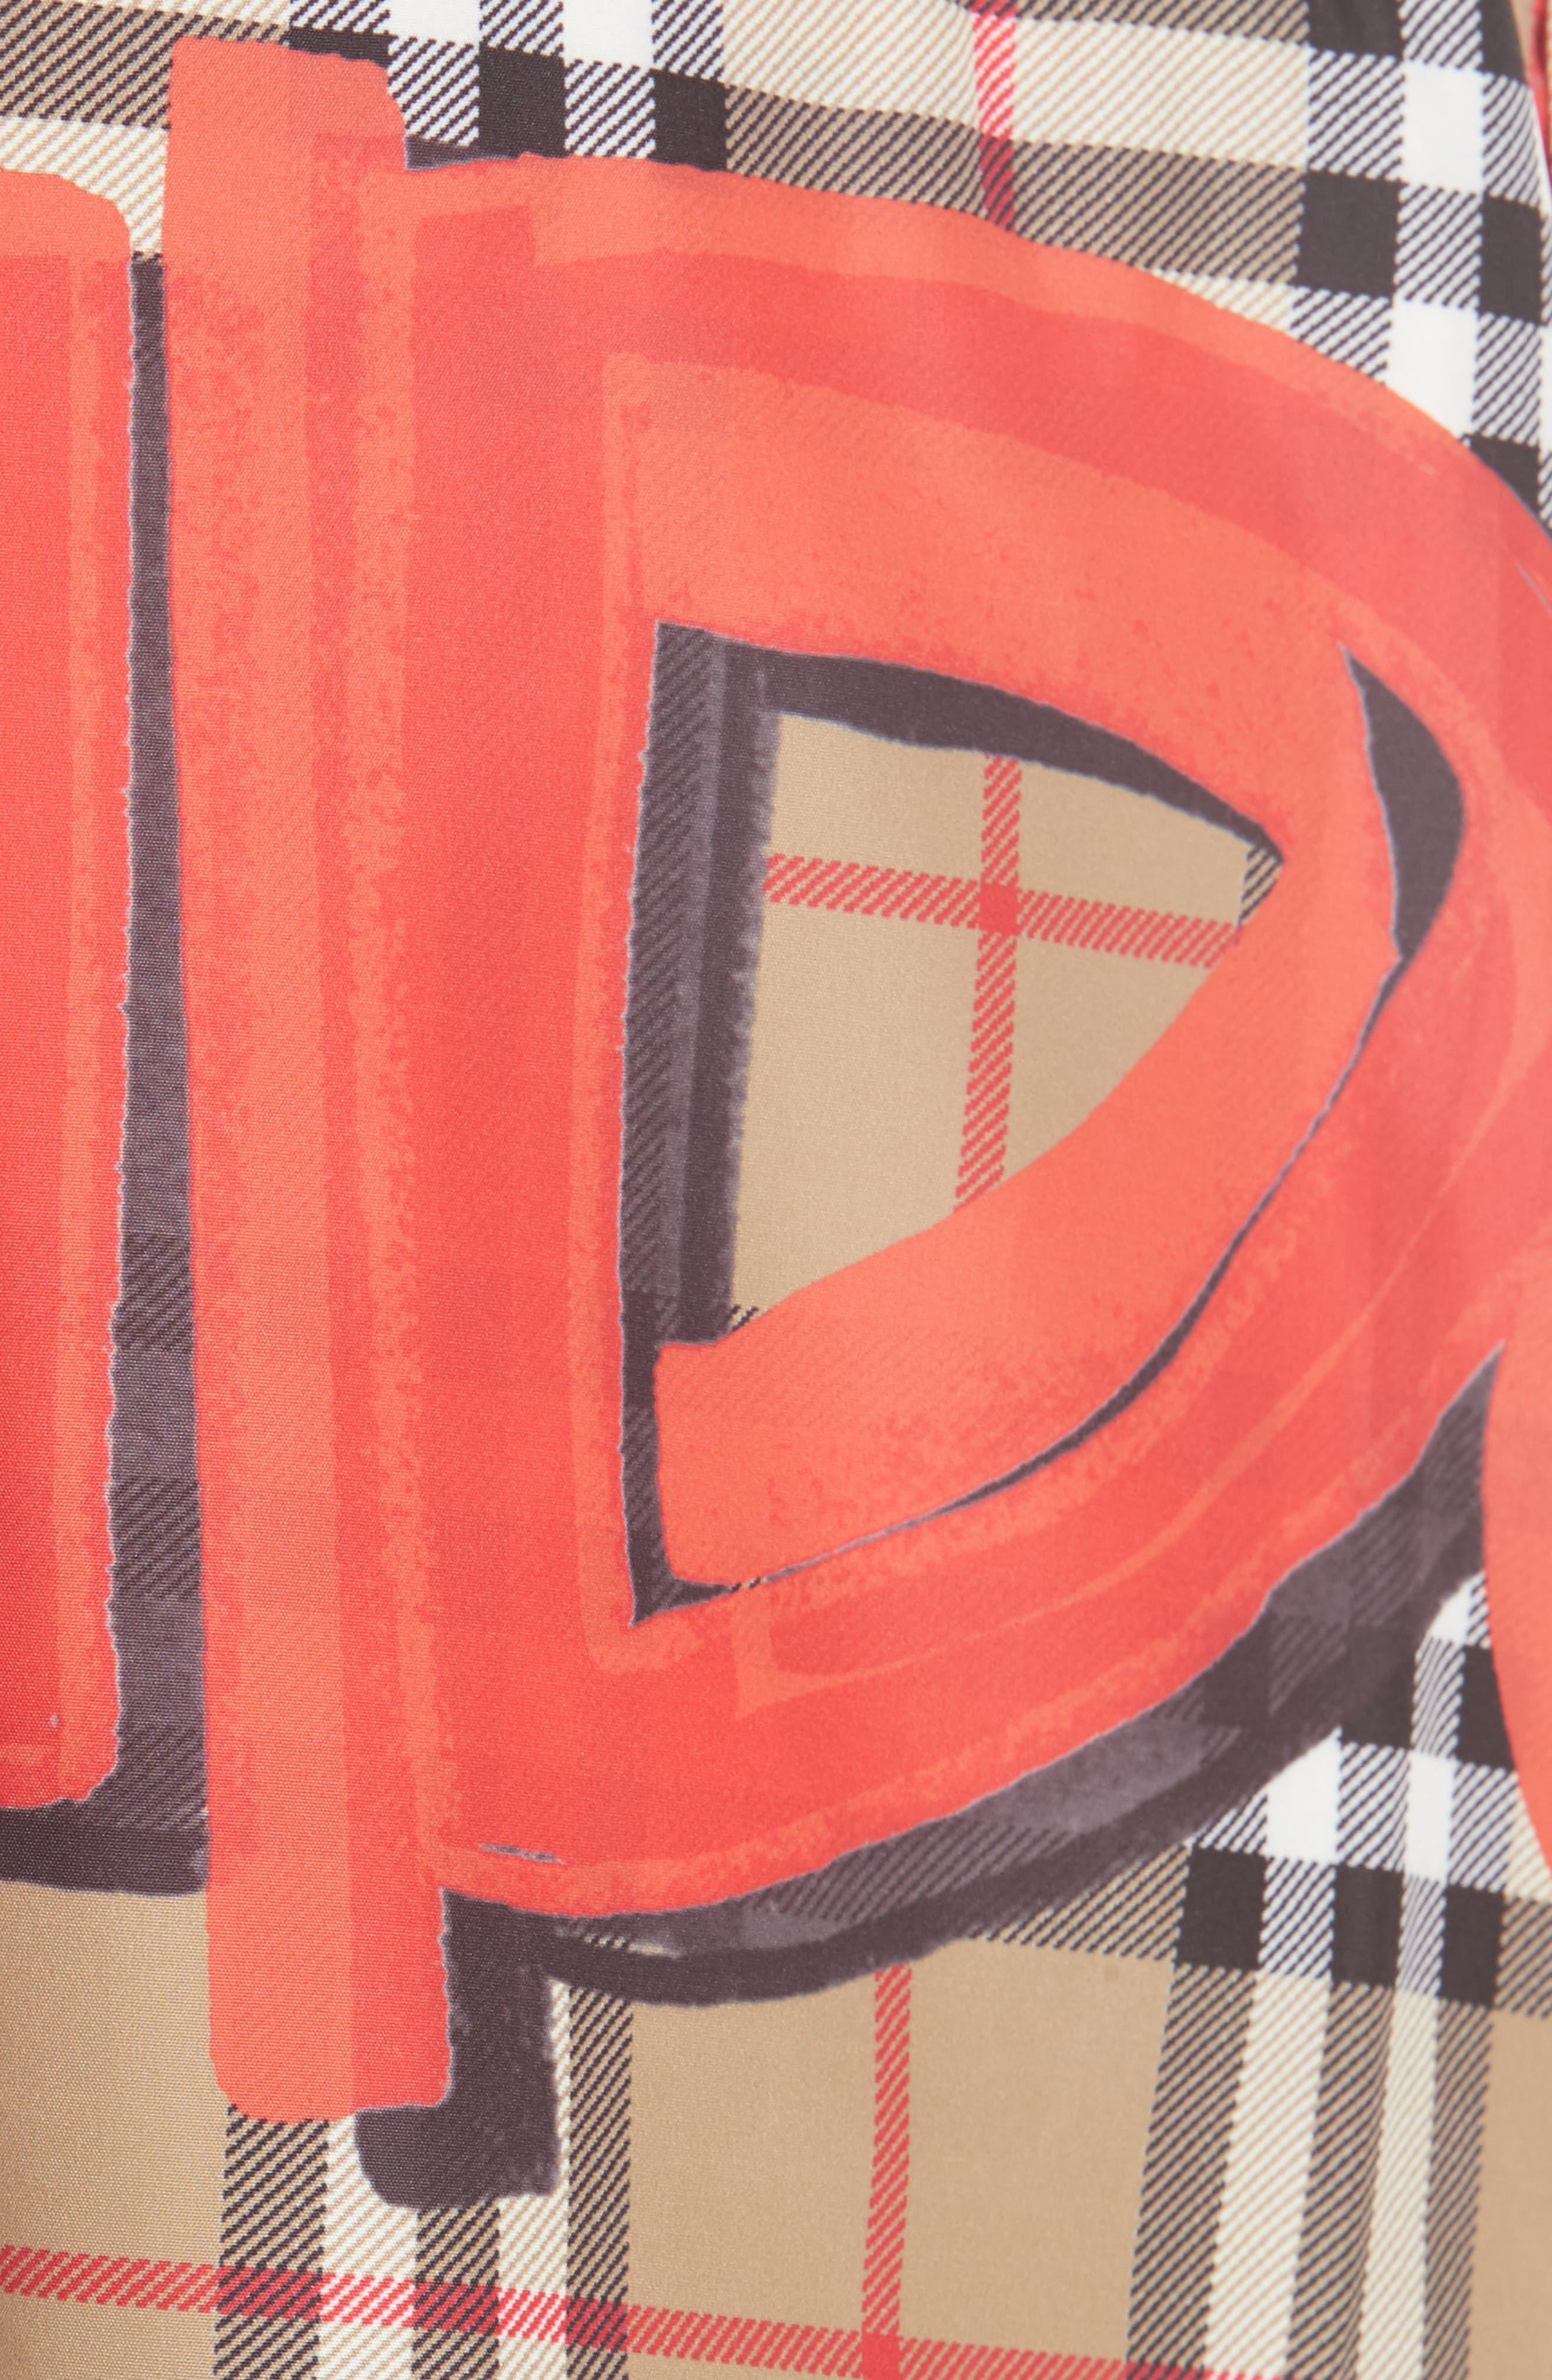 Guildes Graffiti Check Swim Trunks,                             Alternate thumbnail 5, color,                             600